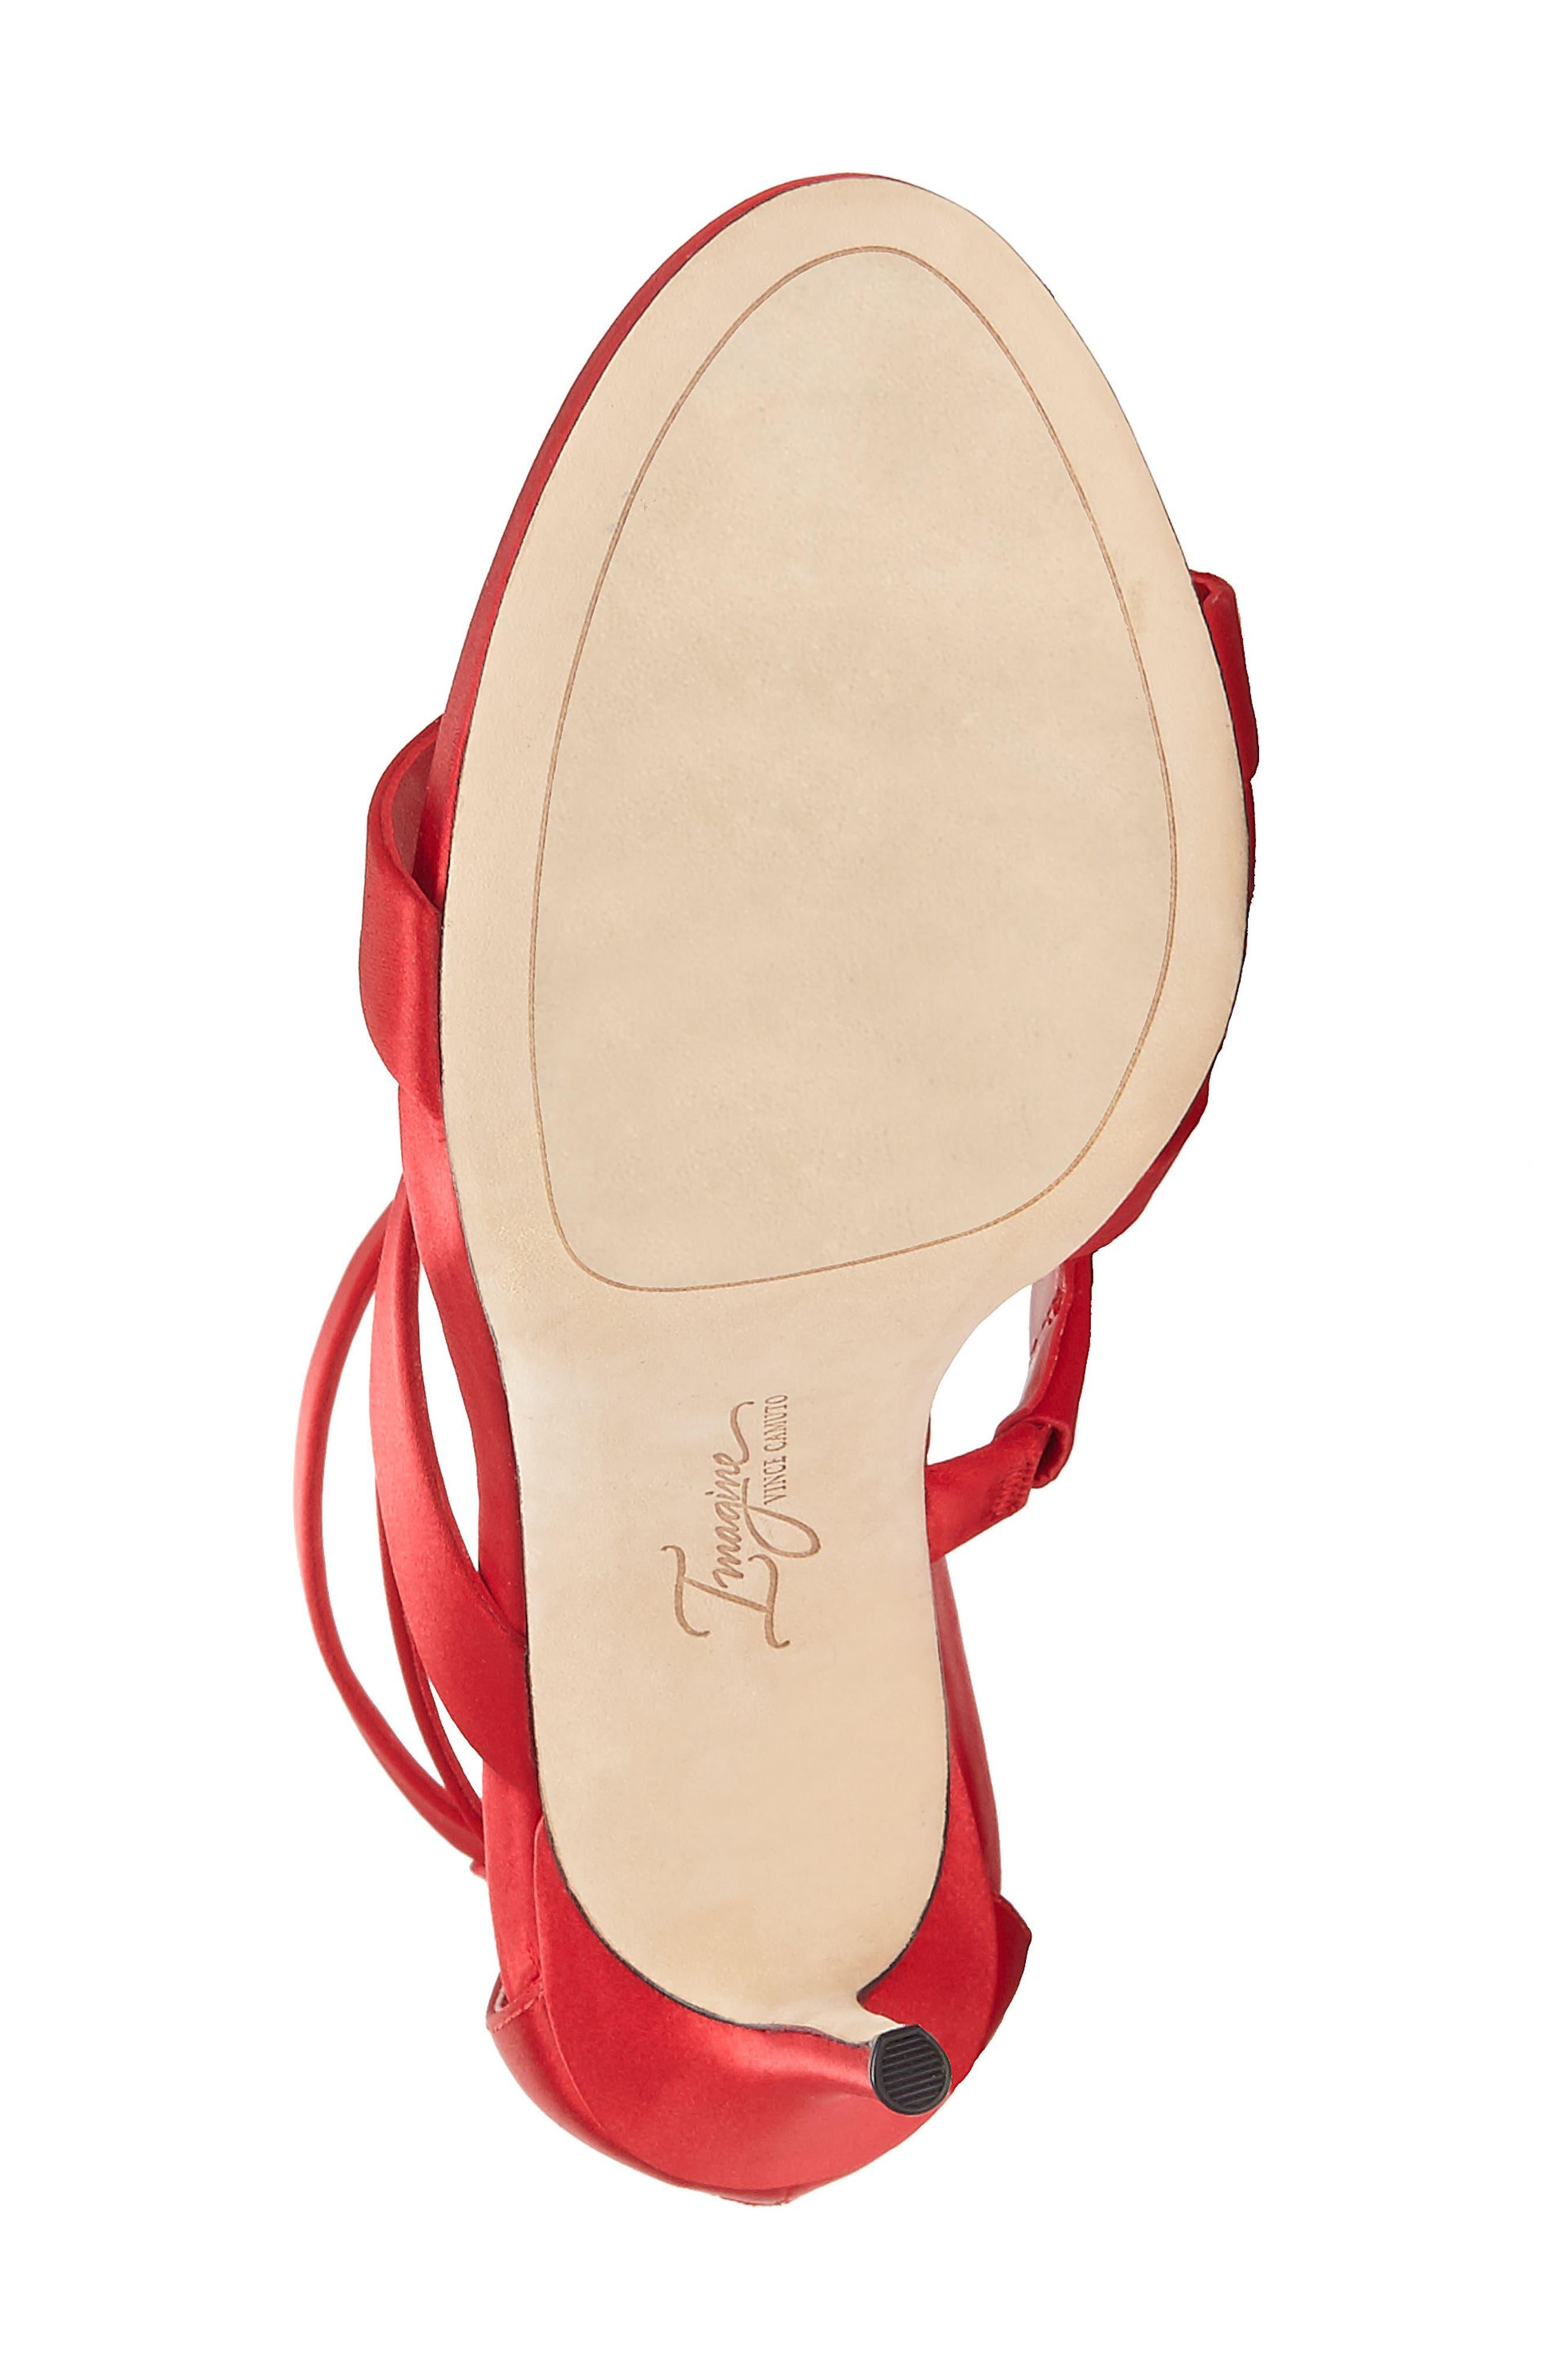 Imagine Vince Camuto Dalles Tall Strappy Sandal,                             Alternate thumbnail 6, color,                             Crimson Satin